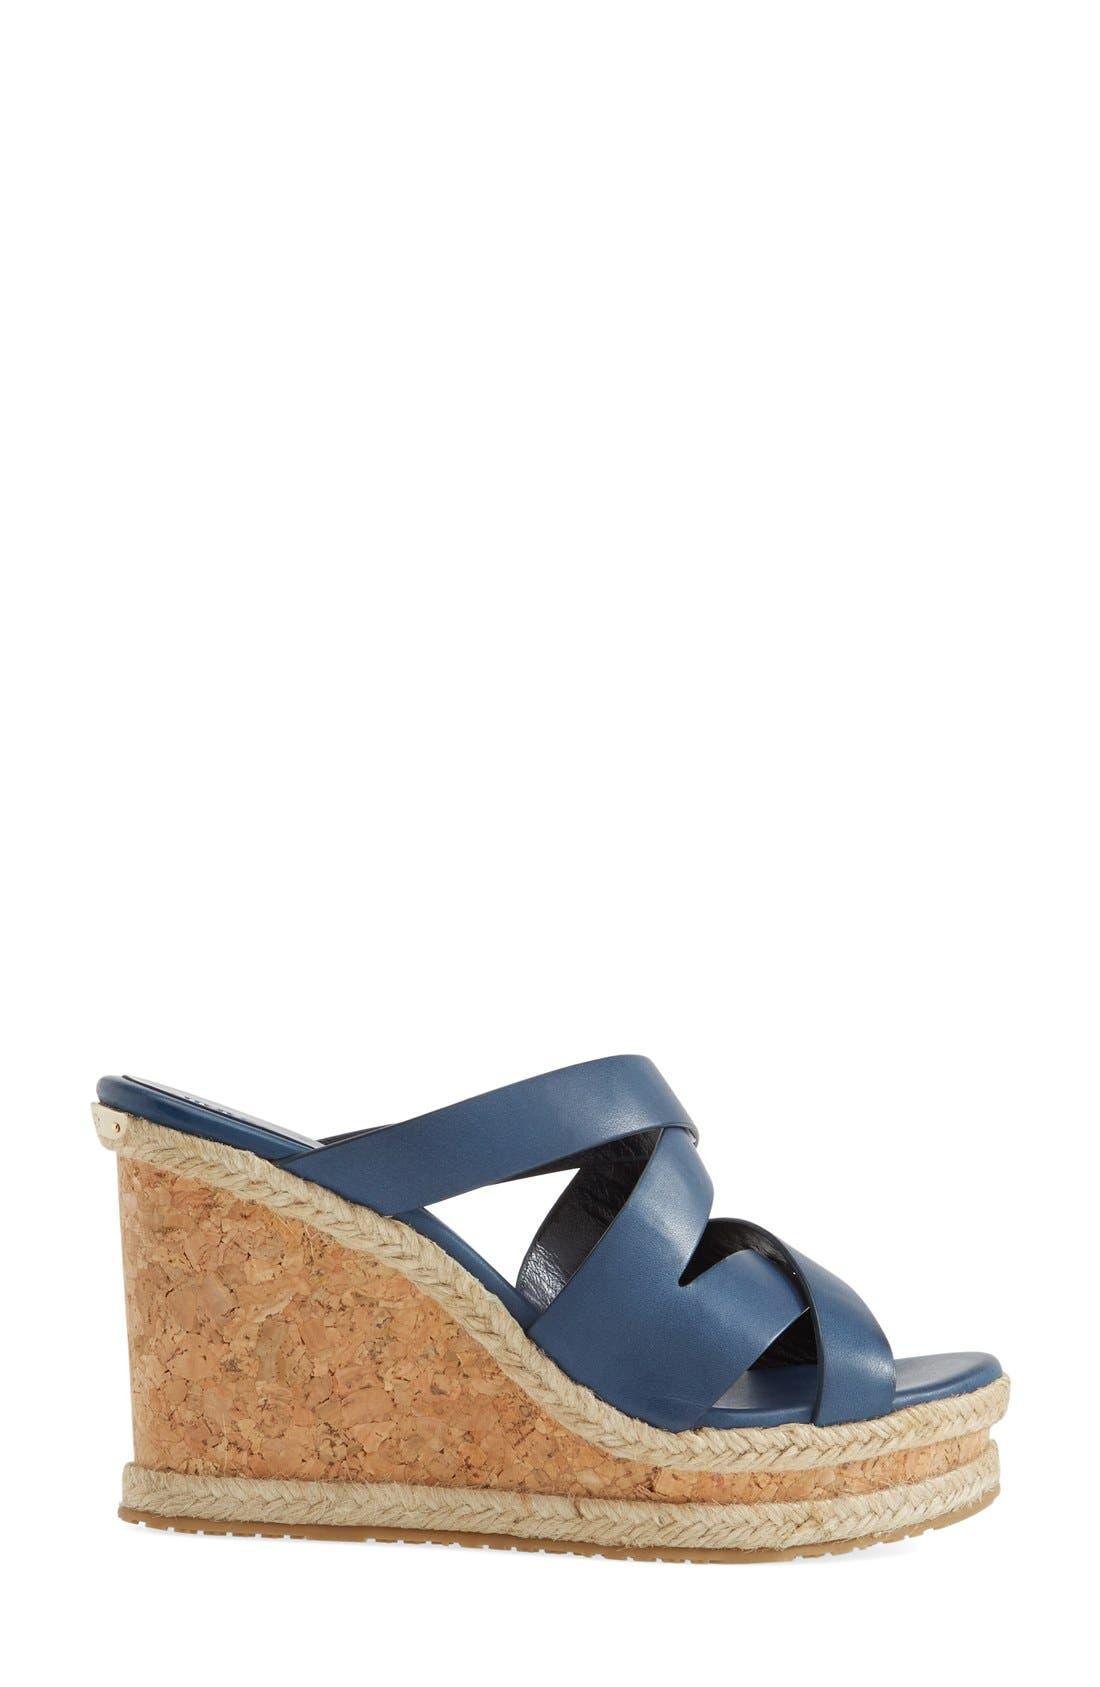 'Prisma' Leather Wedge Sandal,                             Alternate thumbnail 4, color,                             400